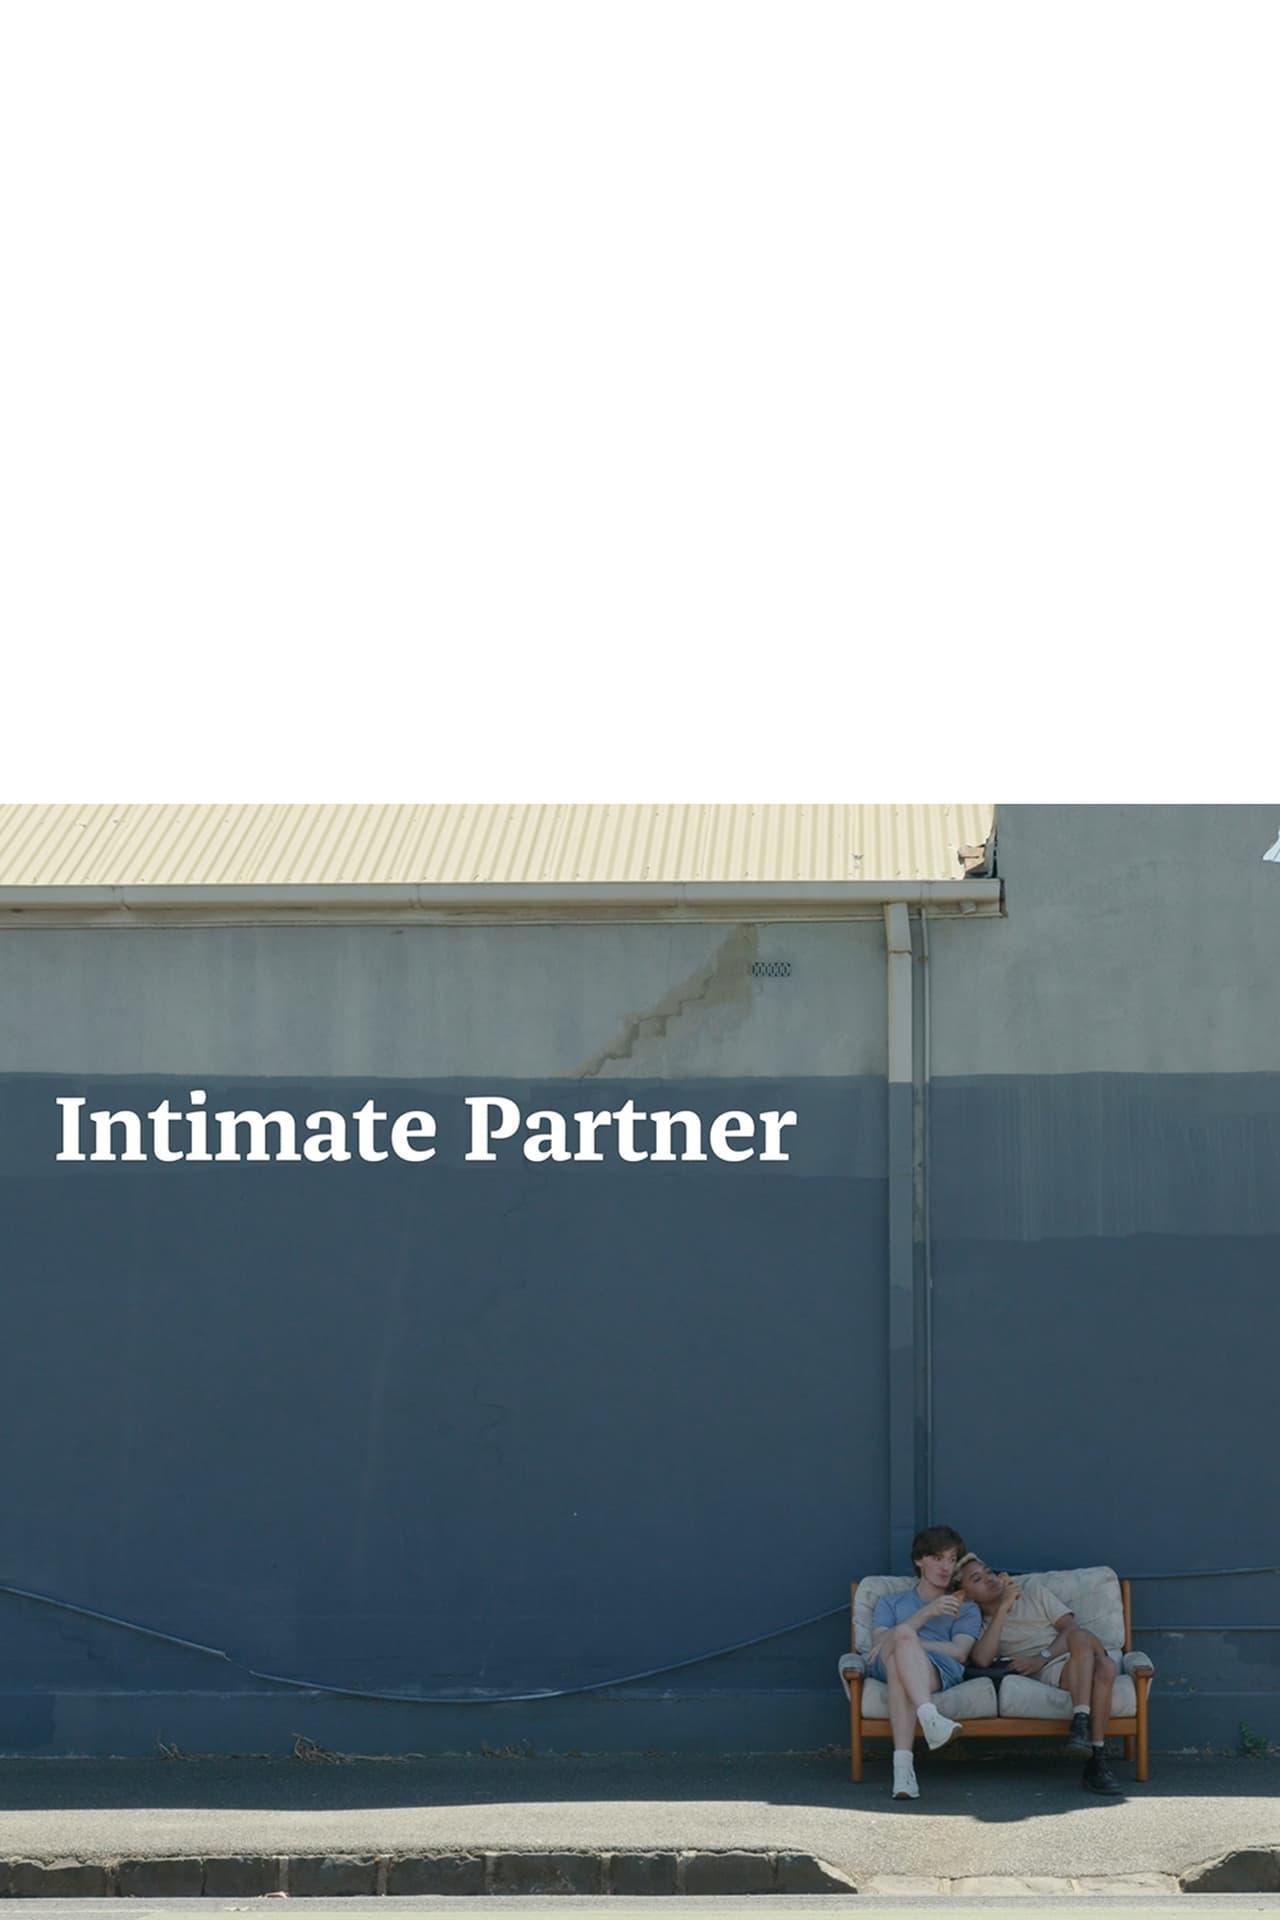 Intimate Partner (2021)